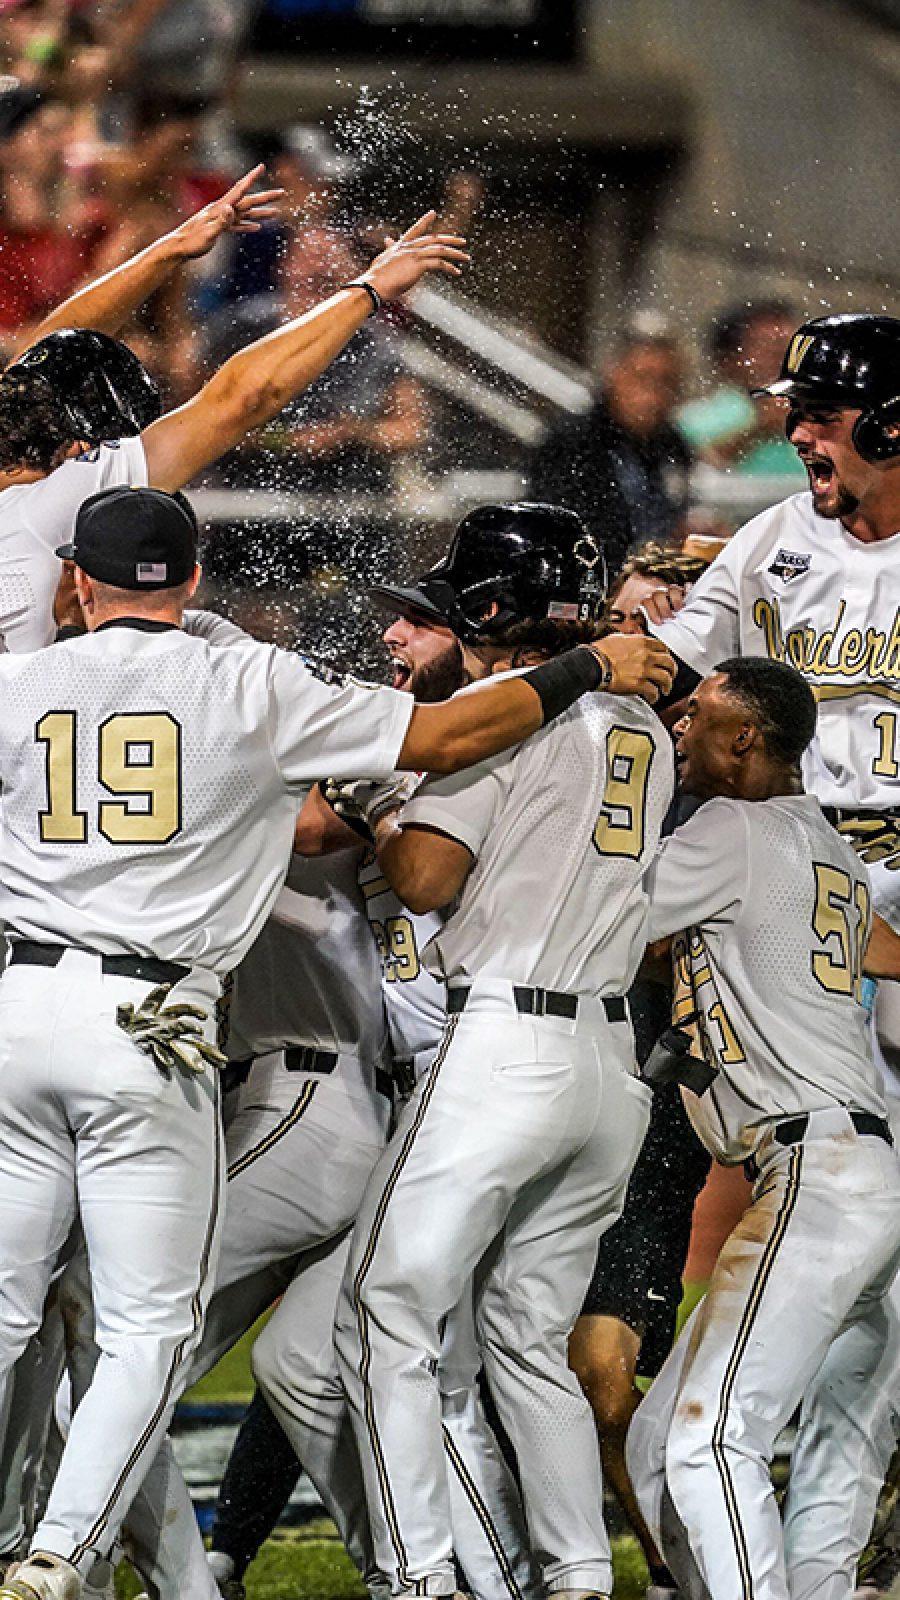 The Vanderbilt baseball team